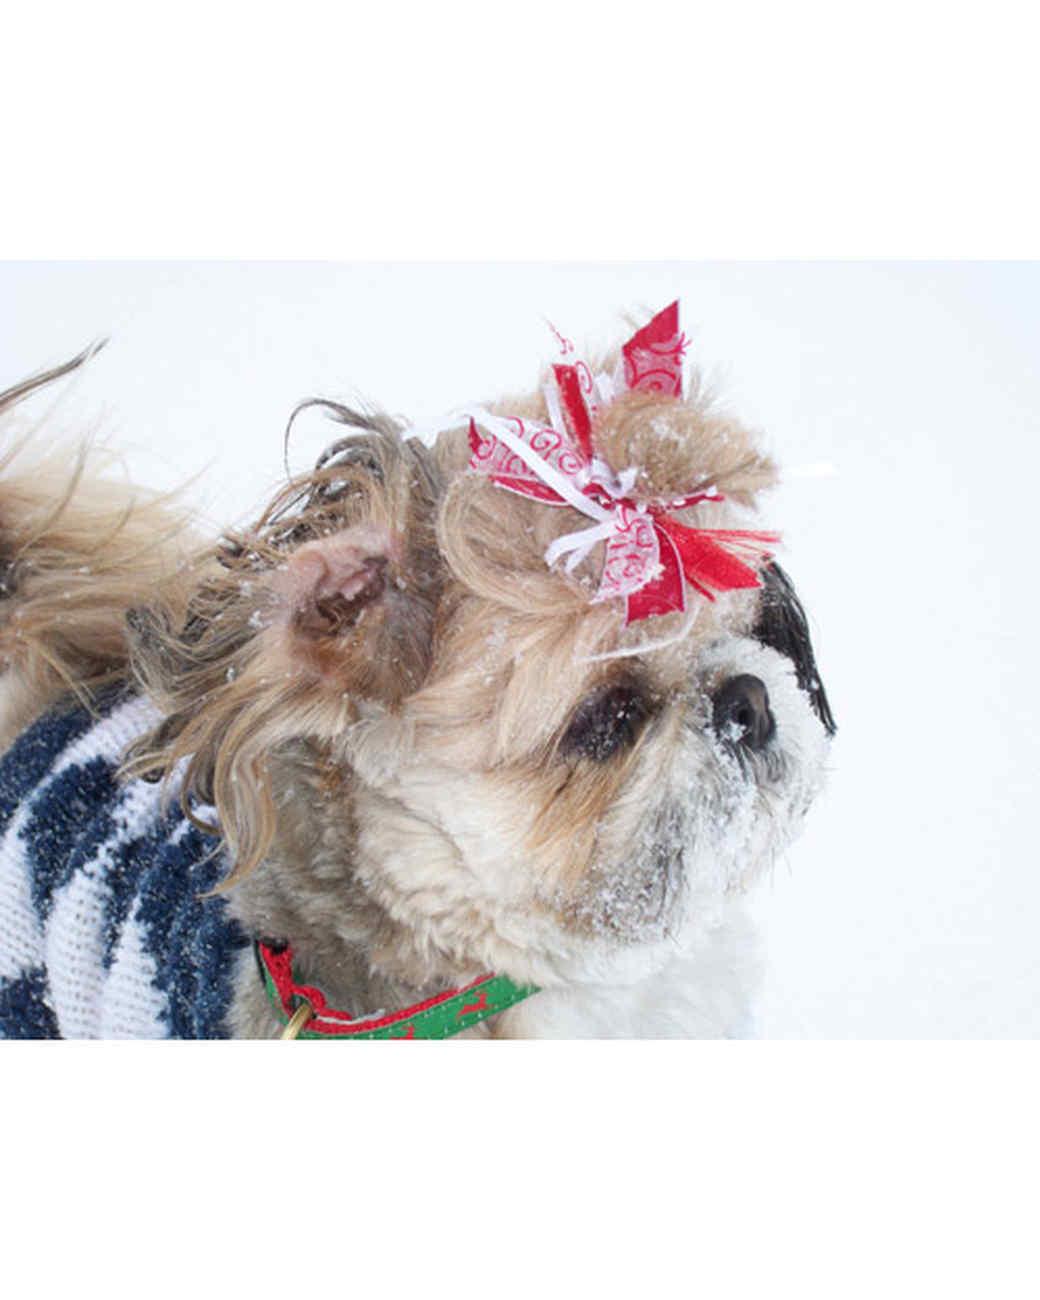 pets_snowangels_7159574_122717_19013479.jpg